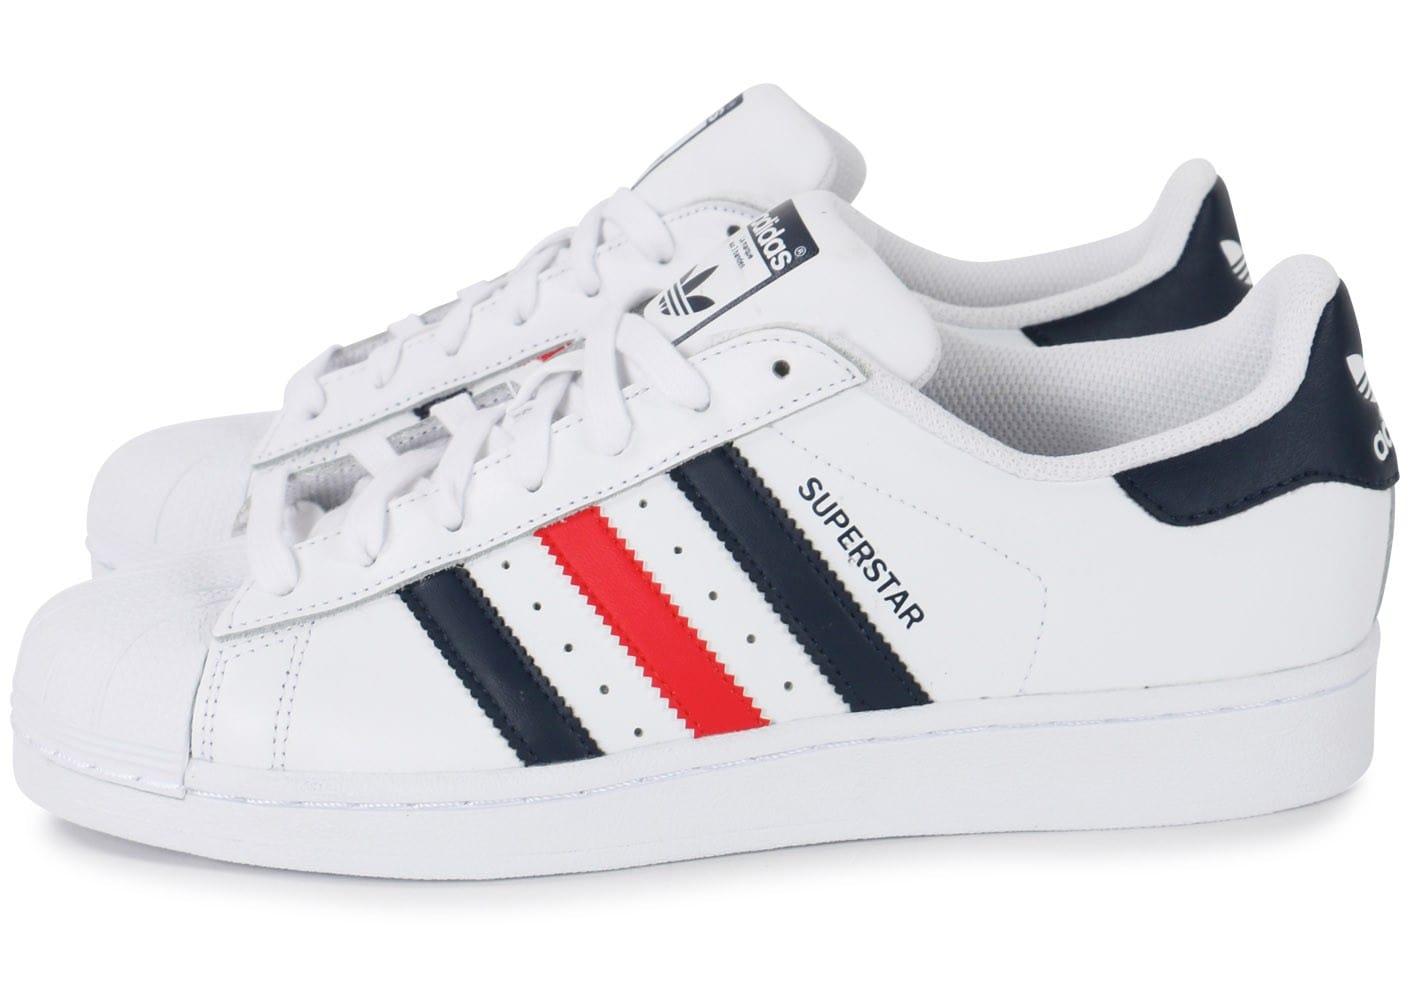 adidas superstar hommes noir et rouge